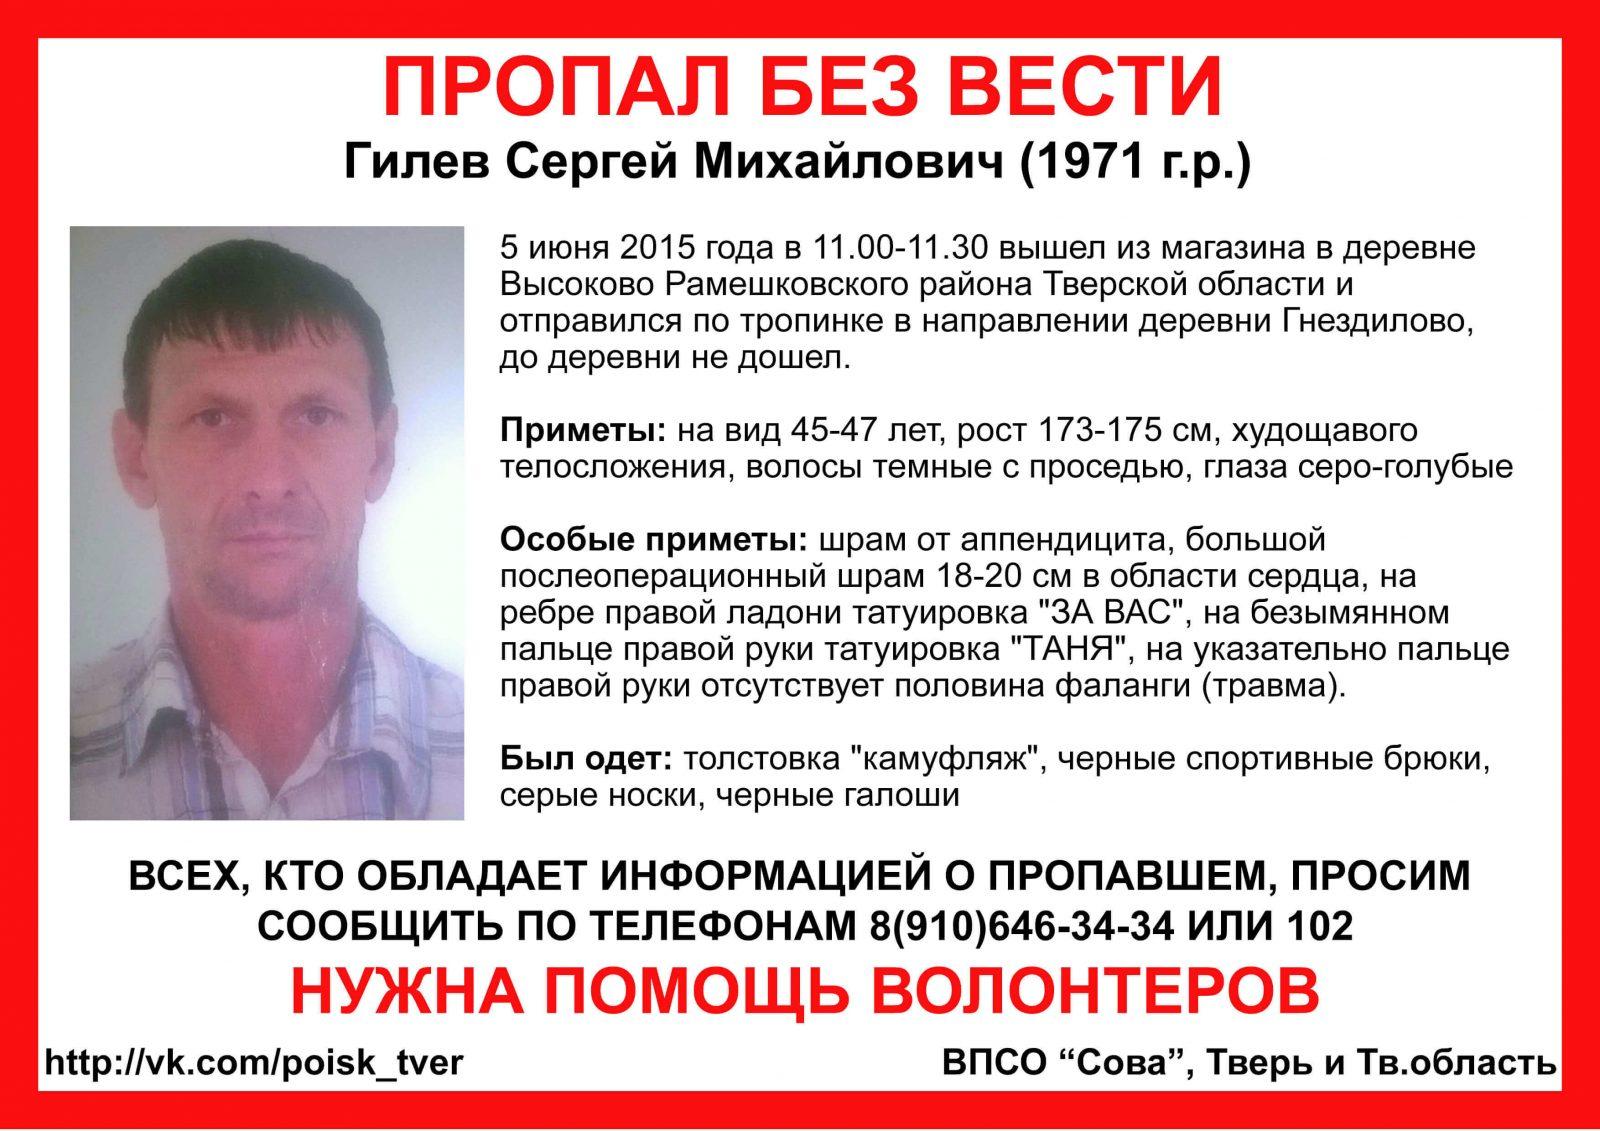 Пропал Гилев Сергей Михайлович (1971 г.р.)